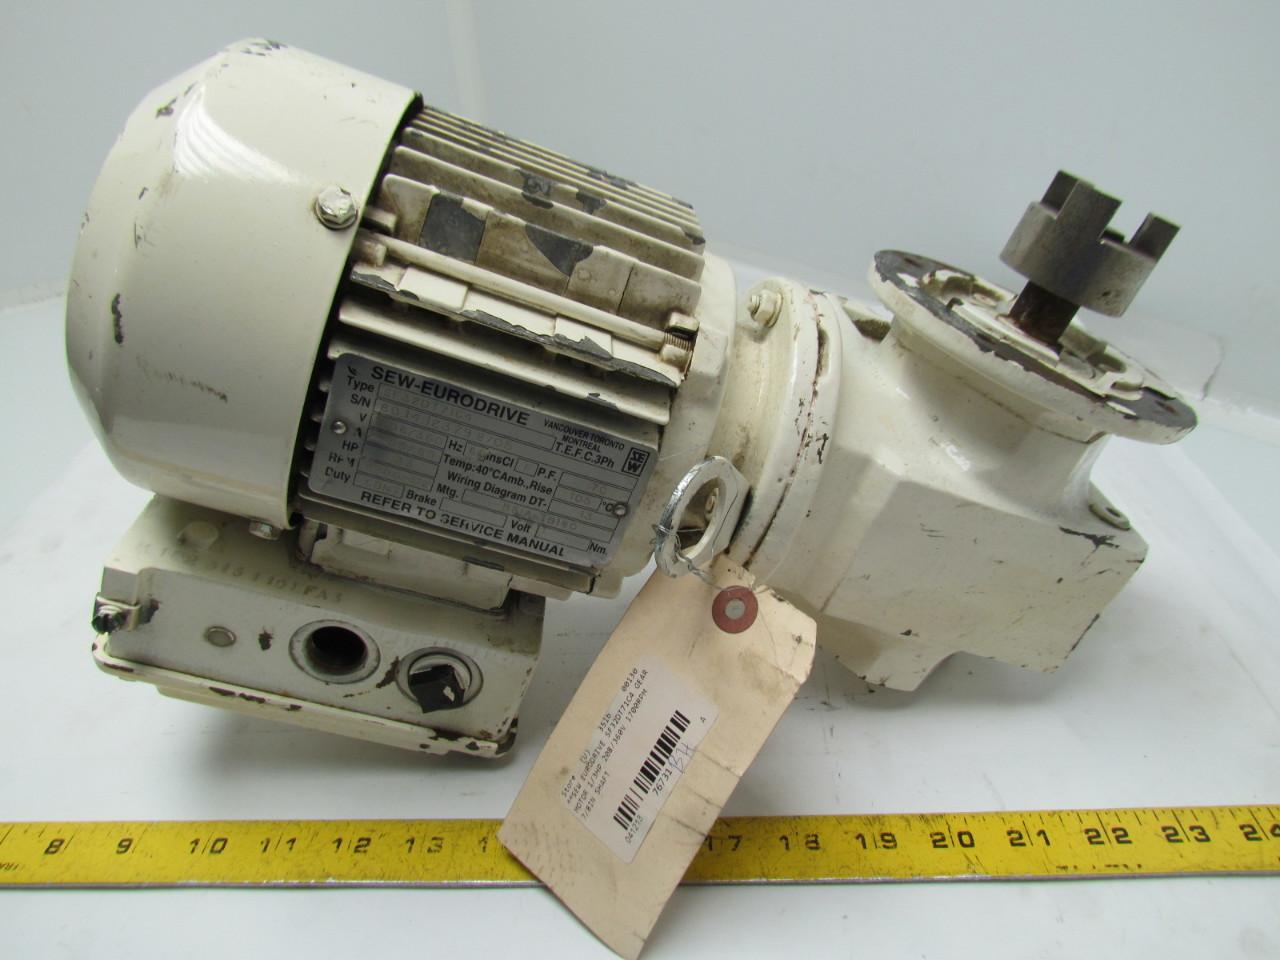 Sew eurodrive sf32dt71c4 15 1 ratio motor gearbox for Sew eurodrive gear motor